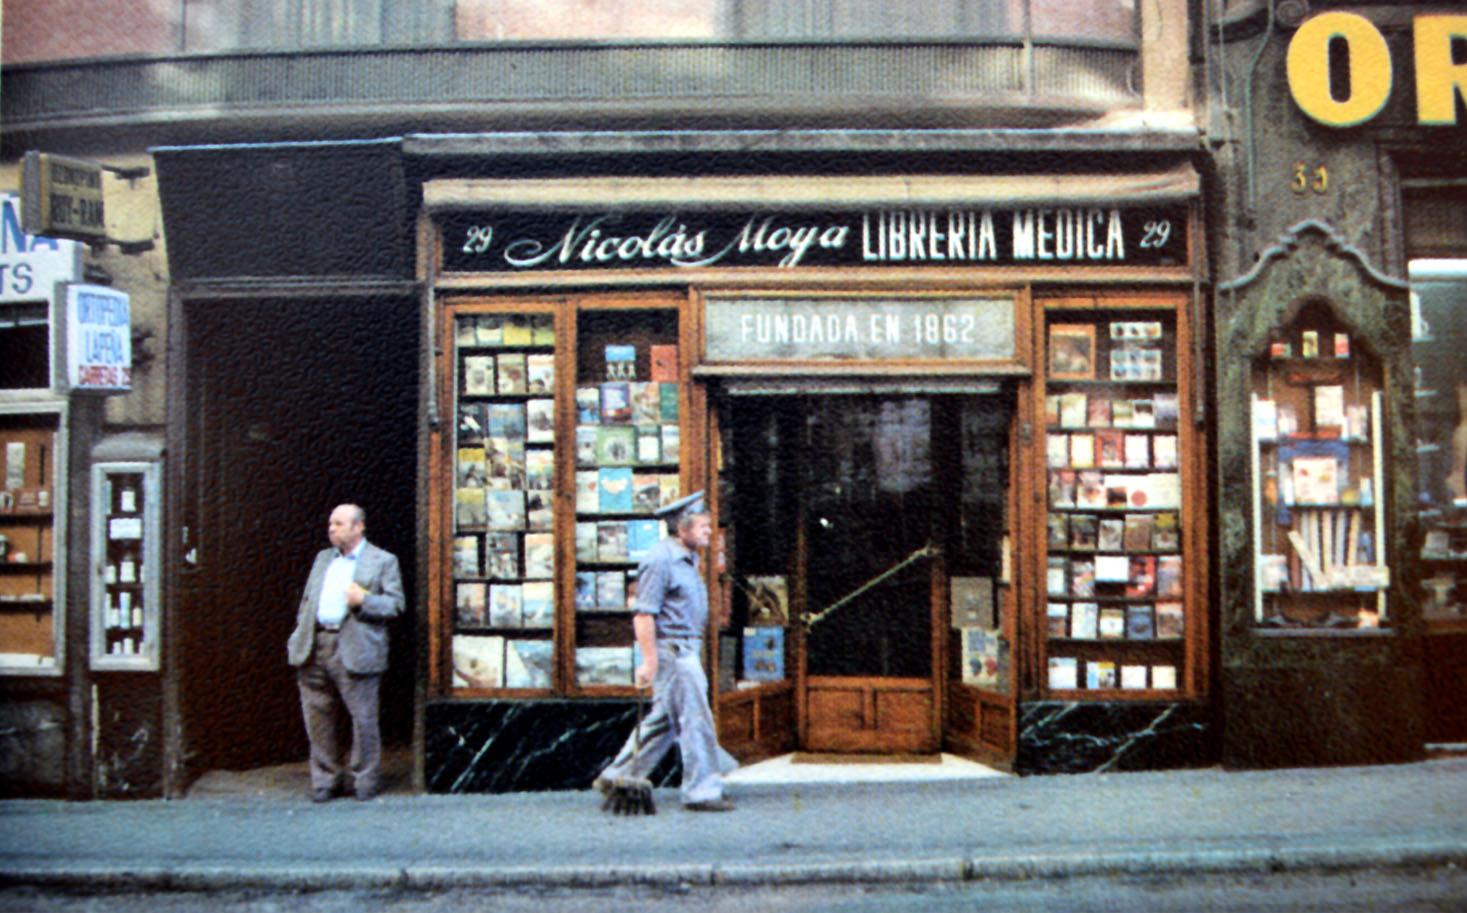 Librería médica Nicolás Moya. Calle Carretas, 29_1980